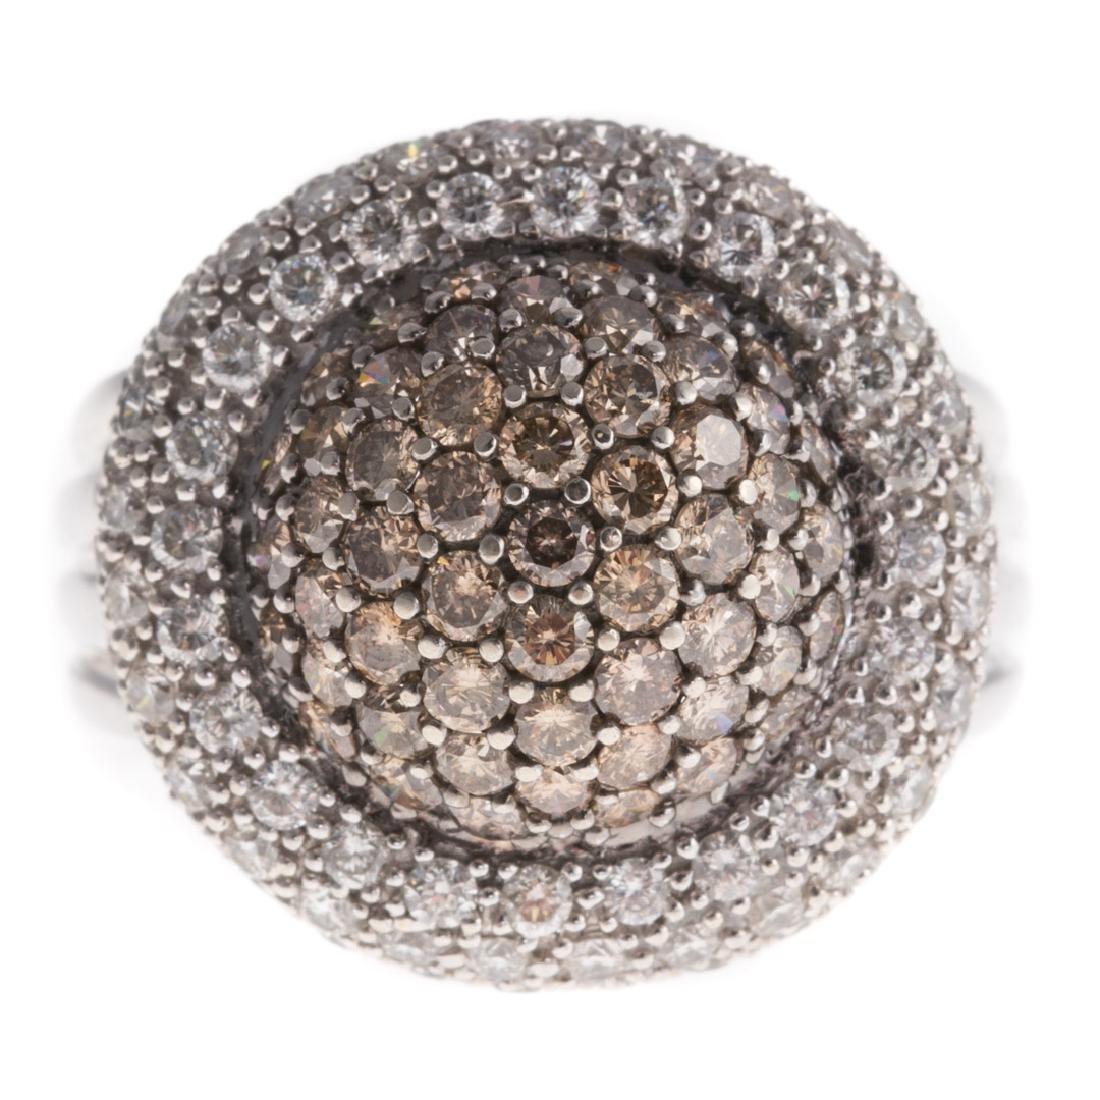 A Lady's Levian Chocolate & White Diamond Ring